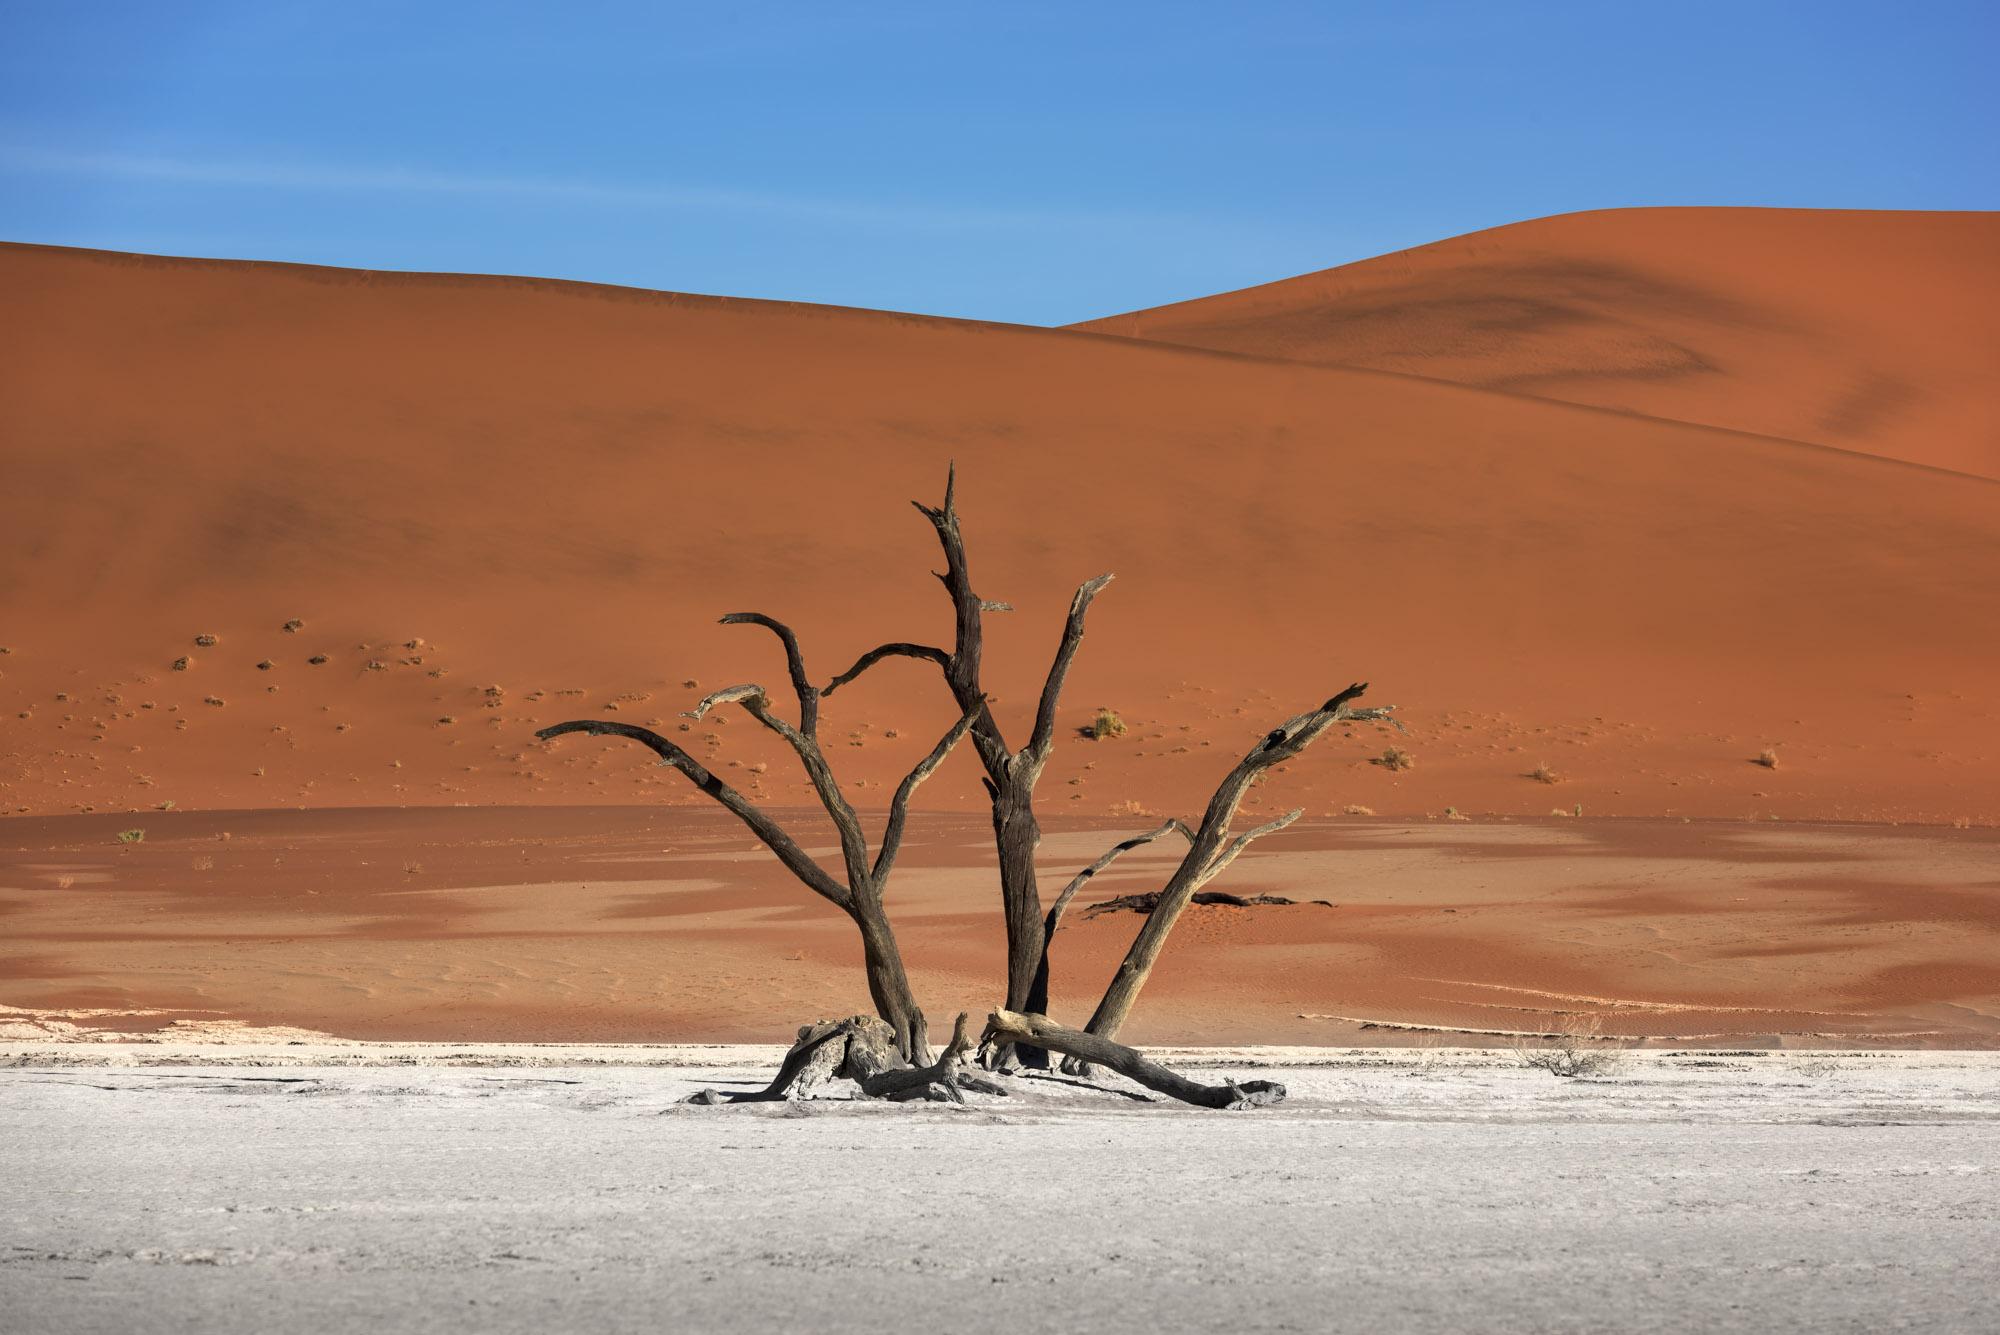 Dead Forest of Deadvlei, Namibia